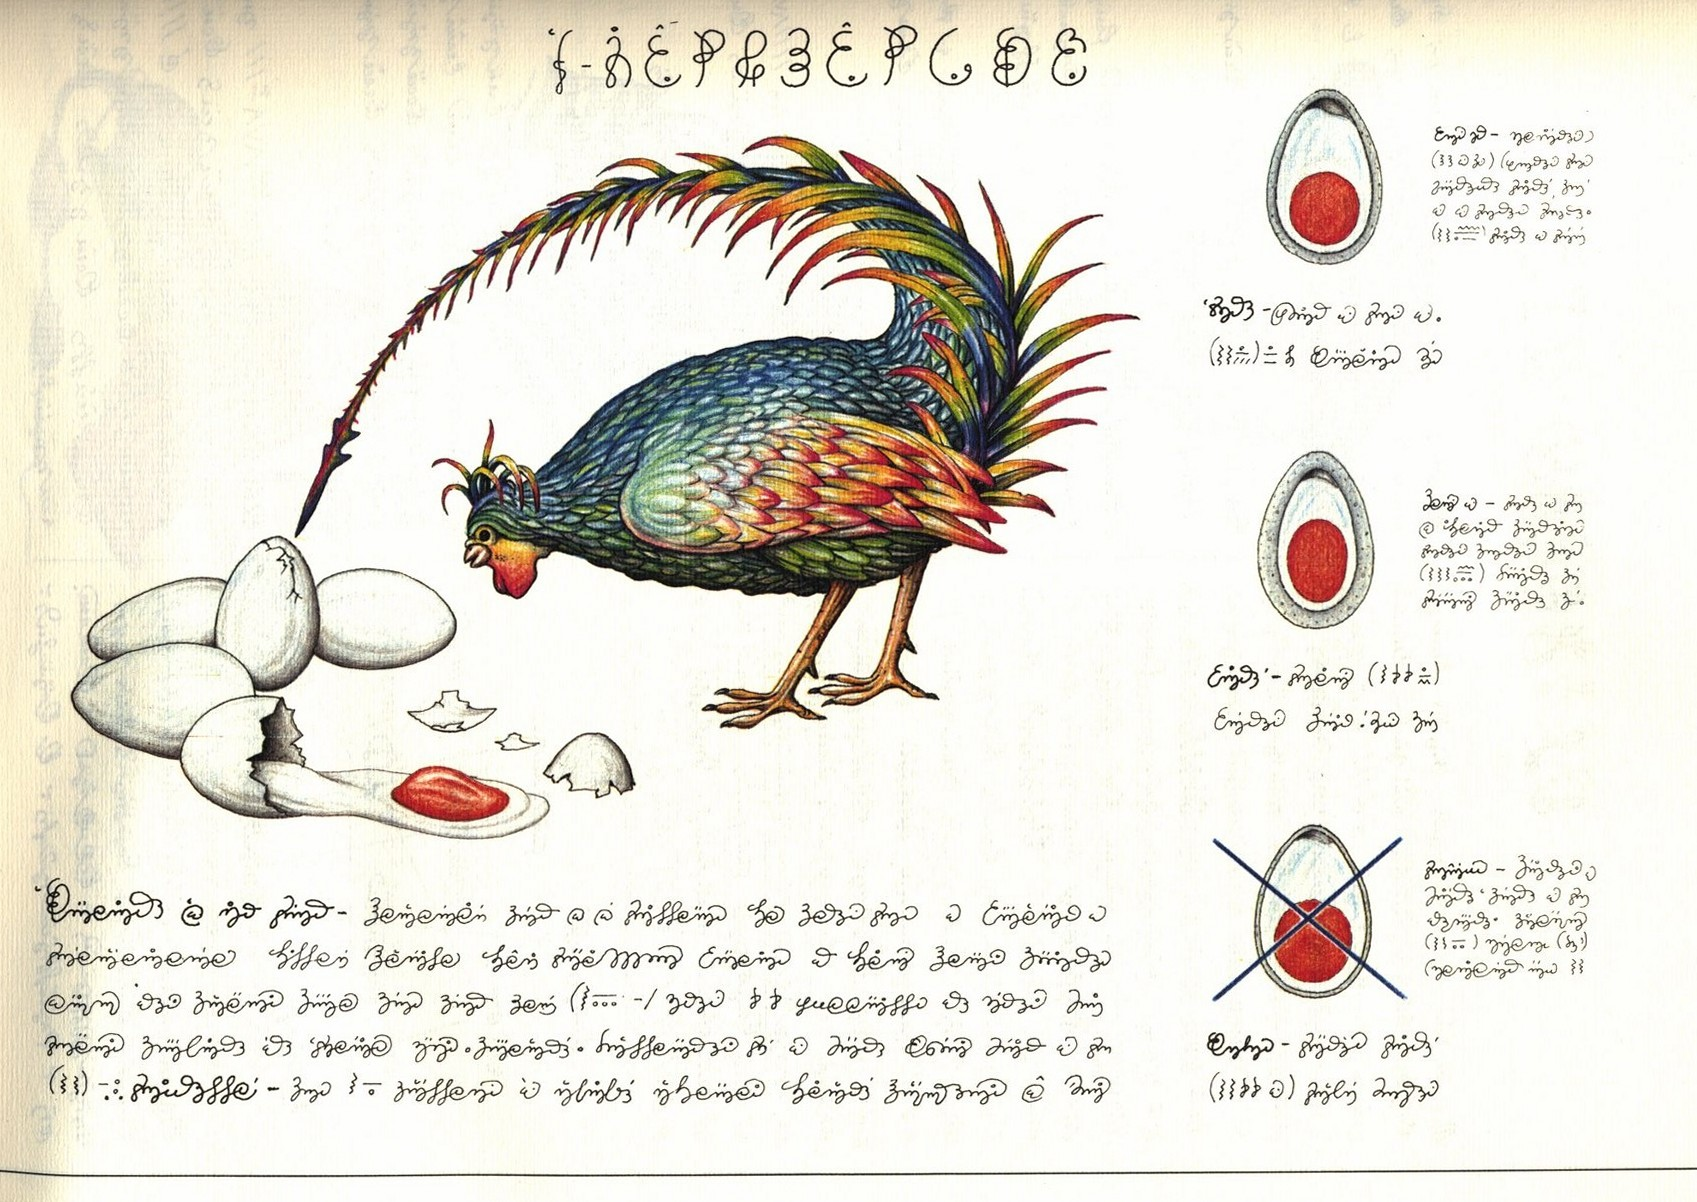 codex-seraphinianus-1983-085.jpg